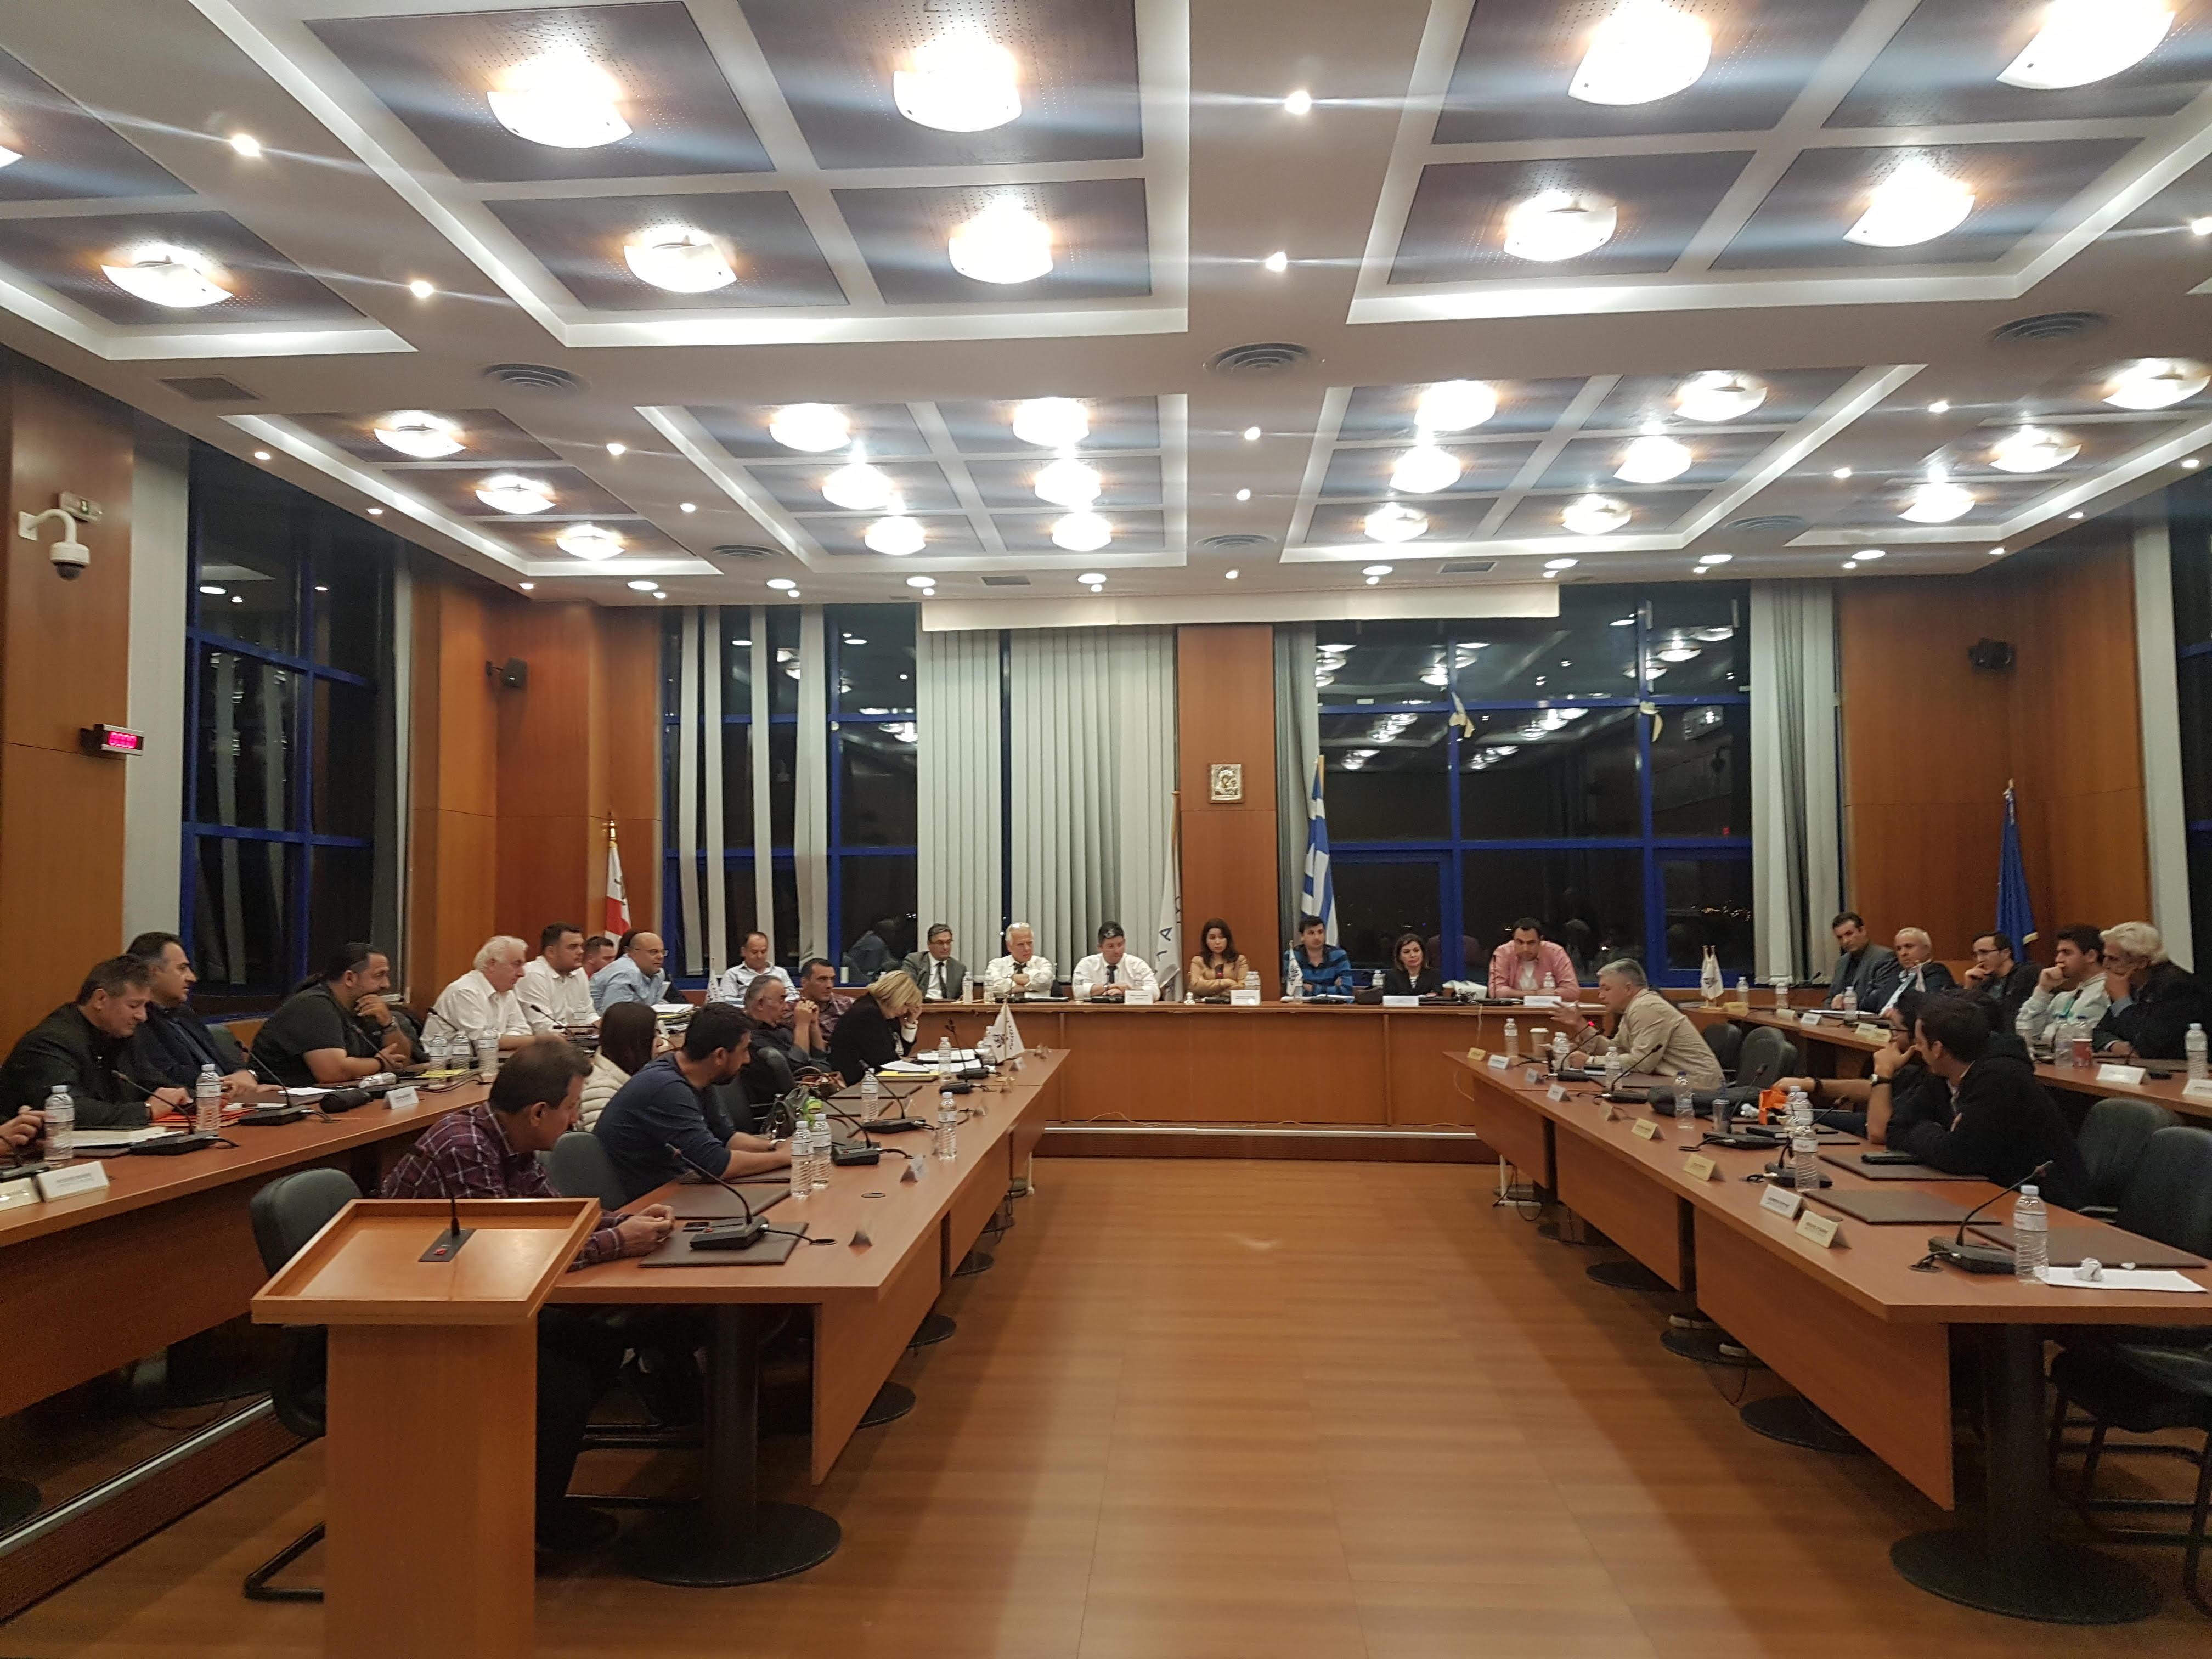 Eνημέρωση για τη γενικότερη κατάσταση του Δήμου με πρωτοβουλία του Δημάρχου Αχαρνών